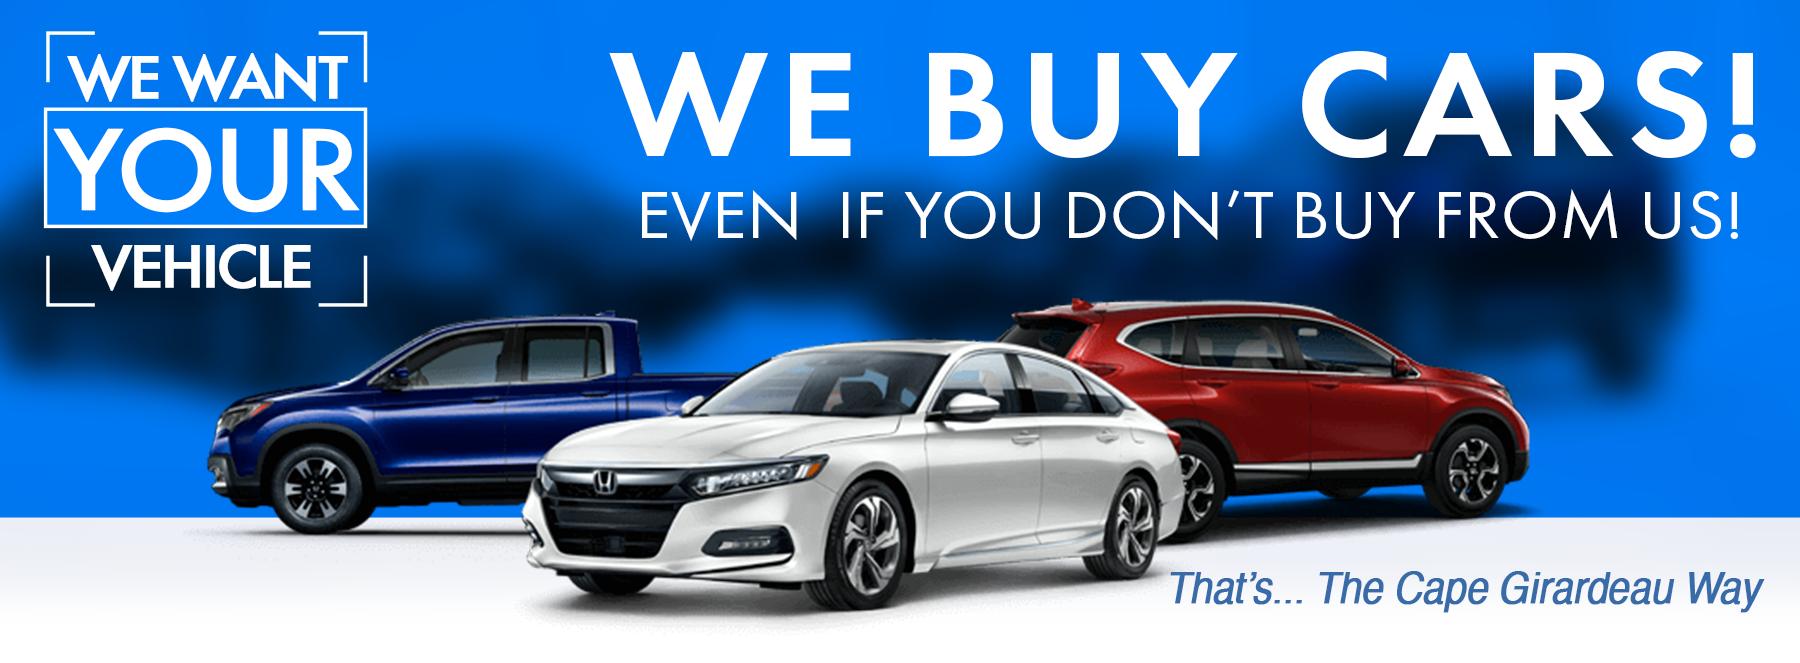 CGH-We Buy Cars-0721